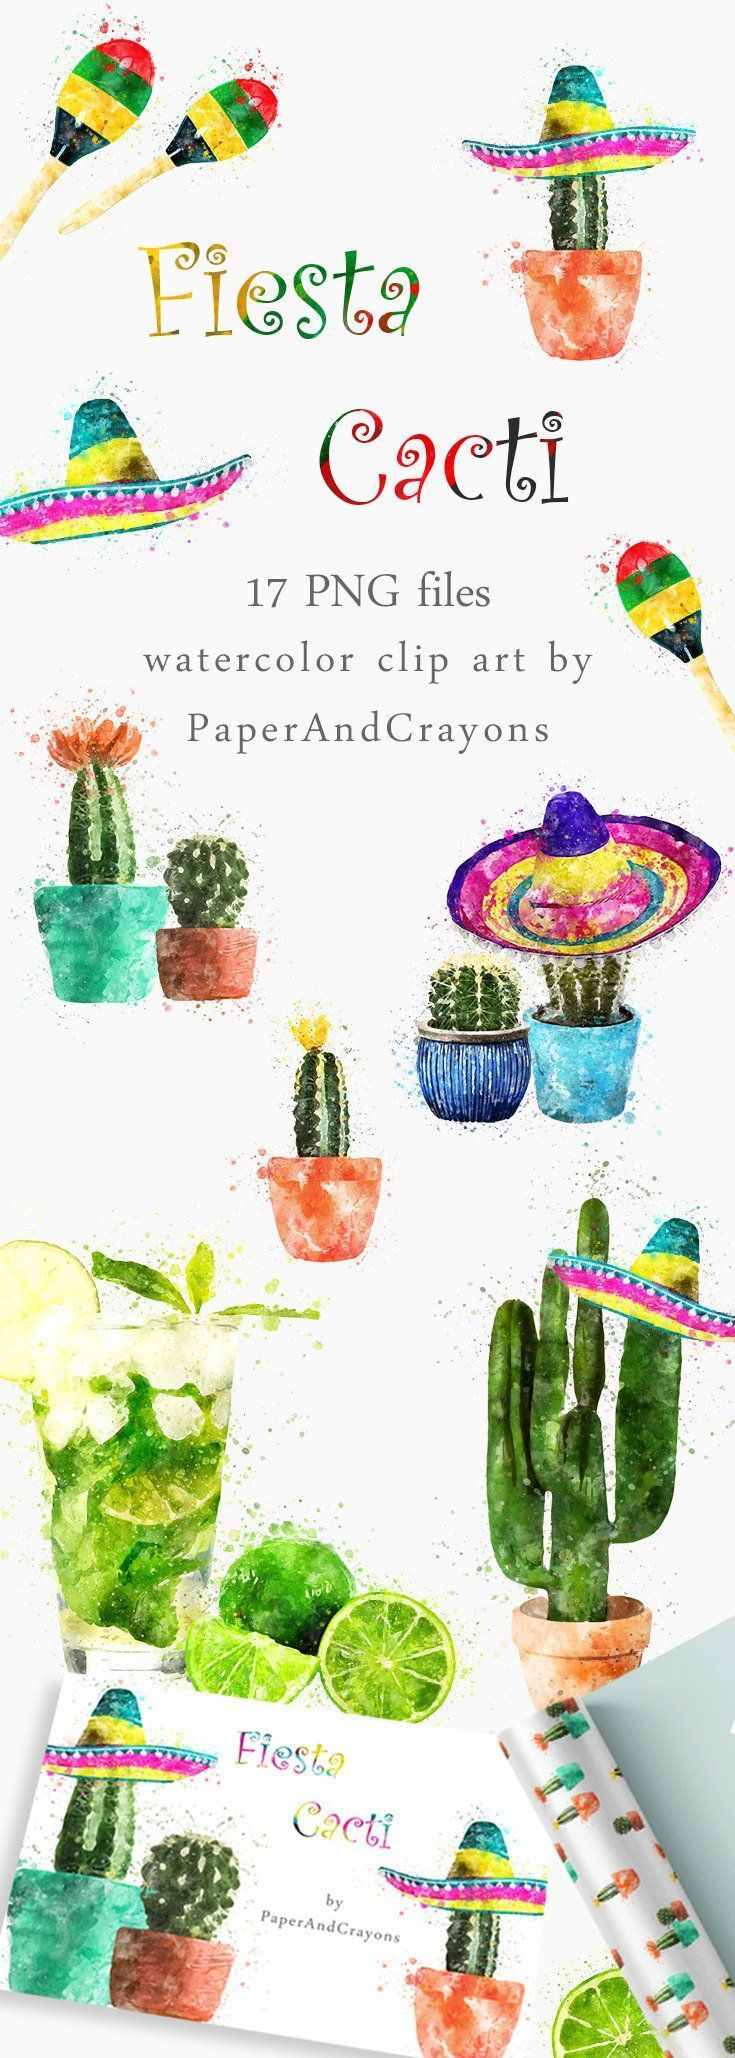 Succulent clipart scrapbooking supply. Fiesta cacti set clip